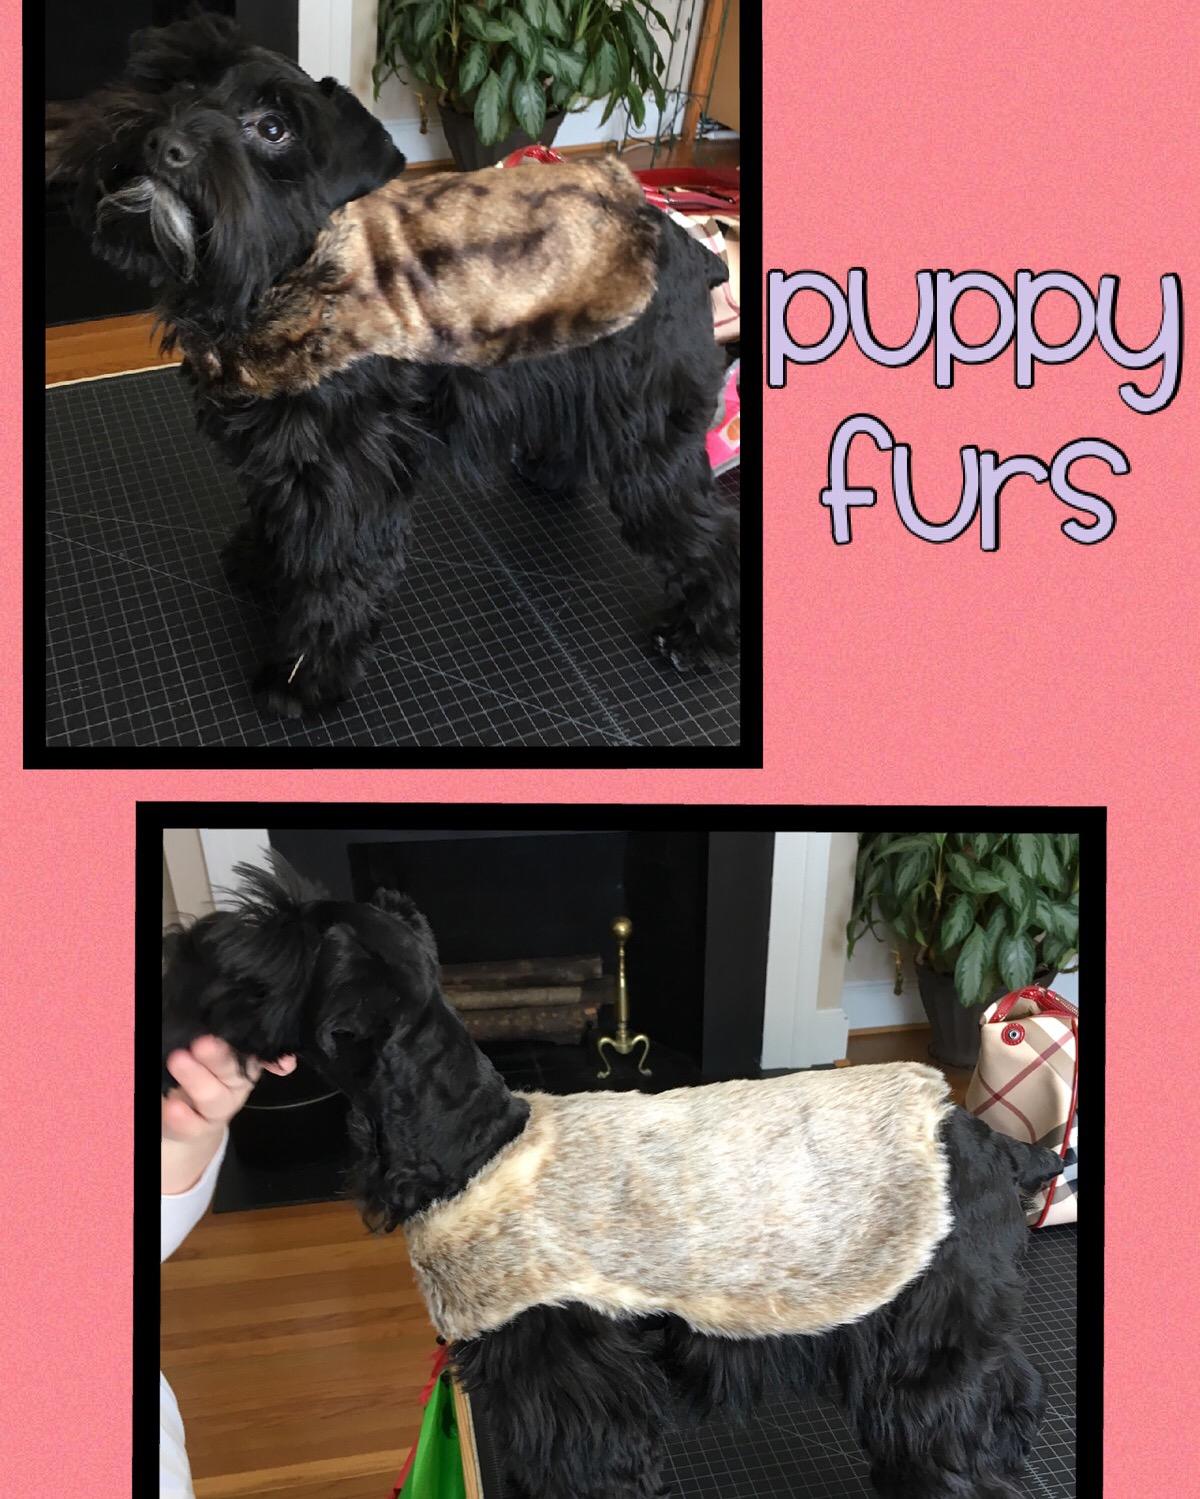 Puppy Furs